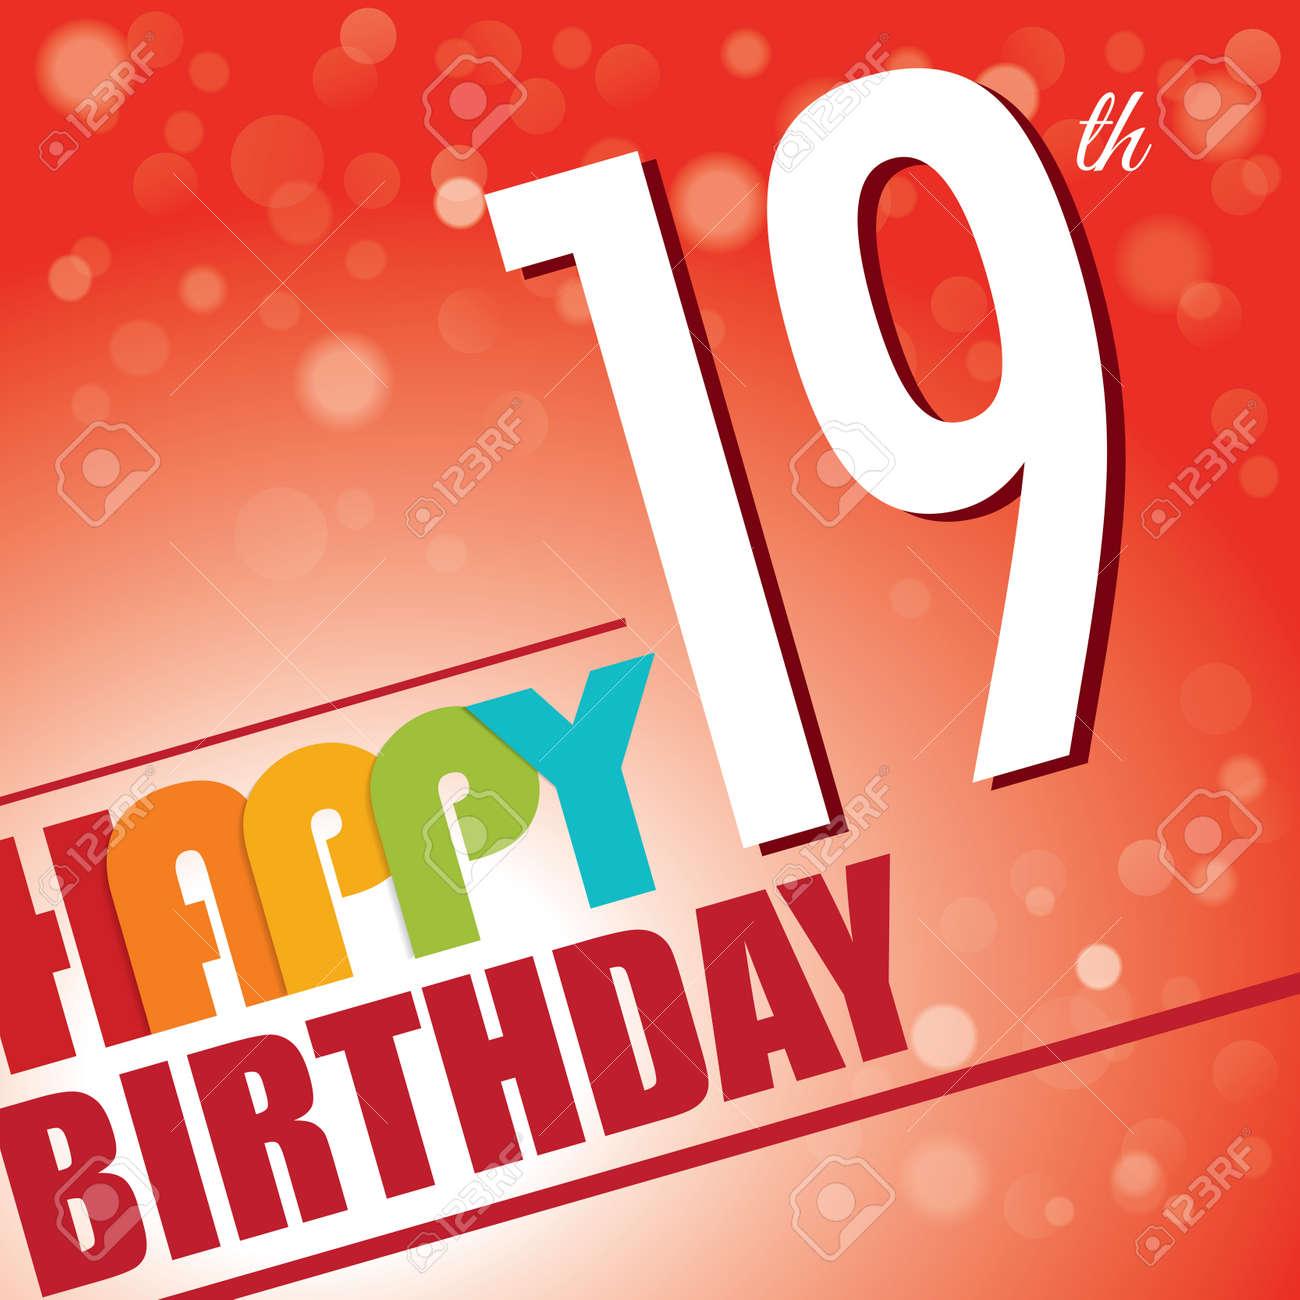 19th Birthday Party Invite Template Design In Bright And Colourful ...